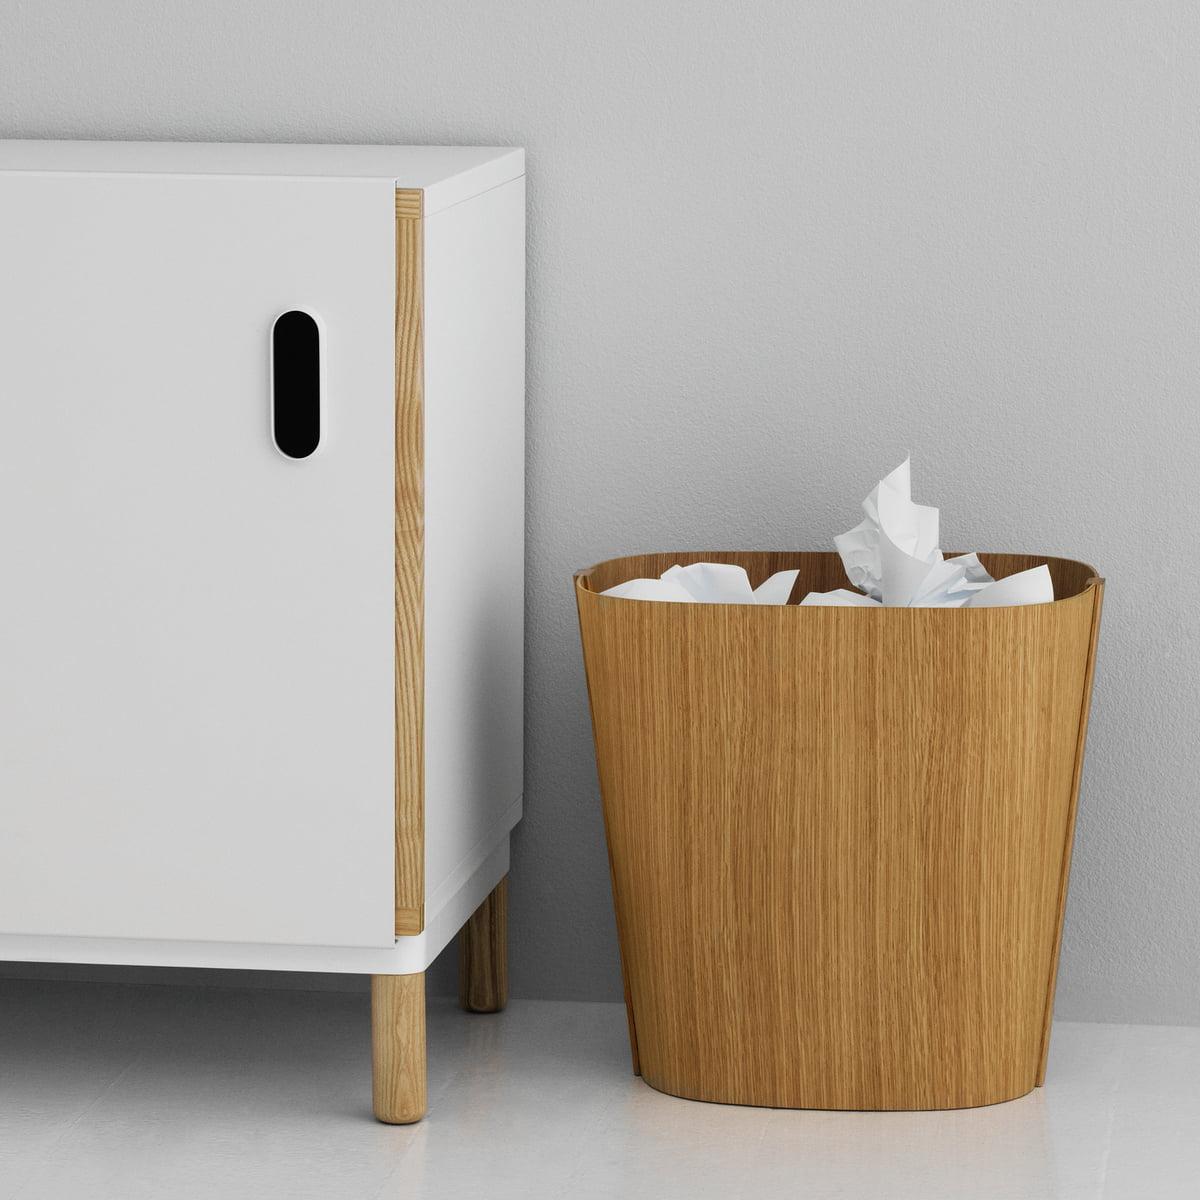 holz papierkorb von normann copenhagen im shop. Black Bedroom Furniture Sets. Home Design Ideas